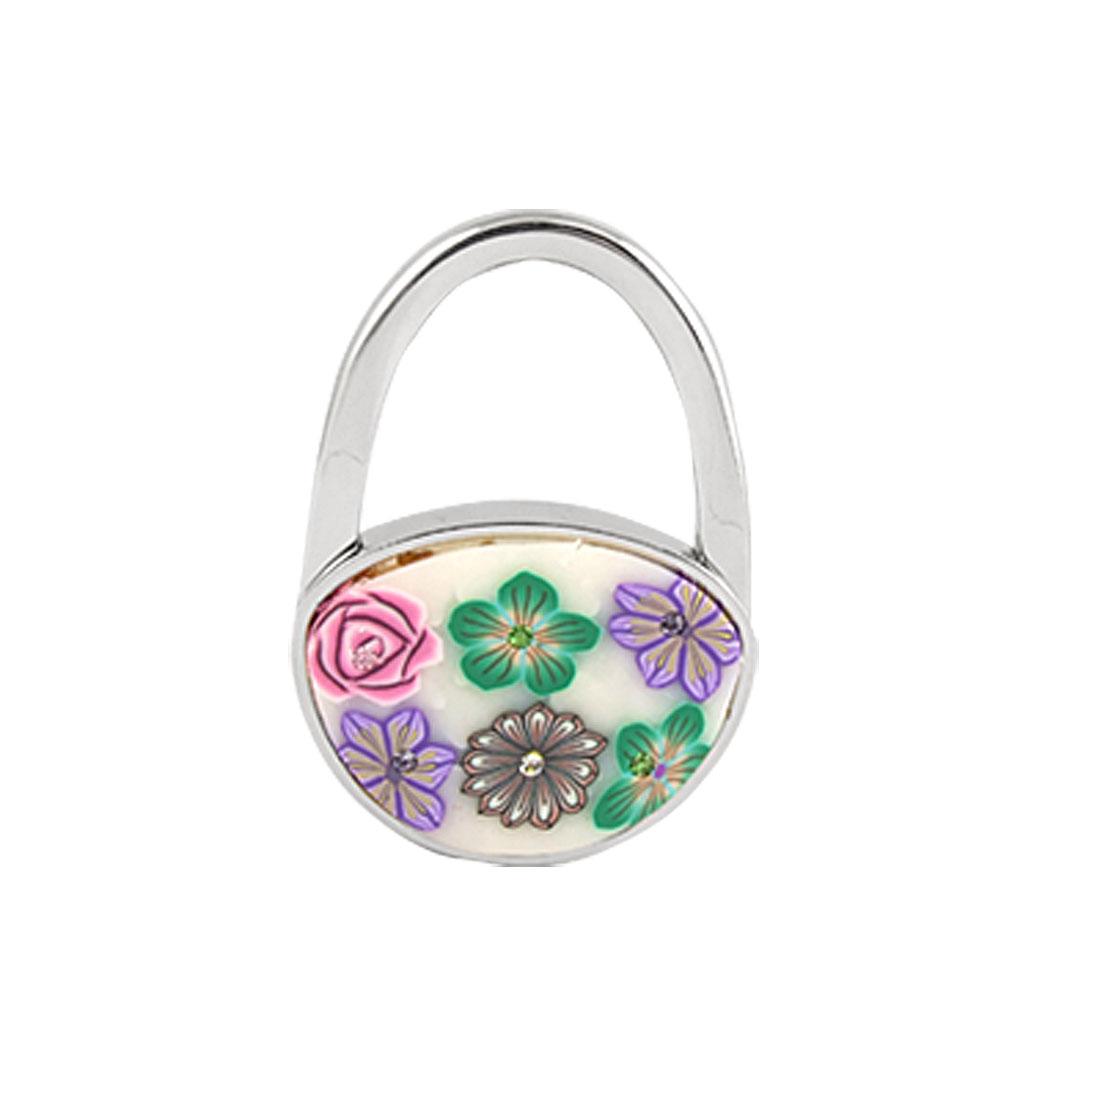 Rhinestone Flower Detail Padlock Shaped Foldable Table Hook for Handbag Purse